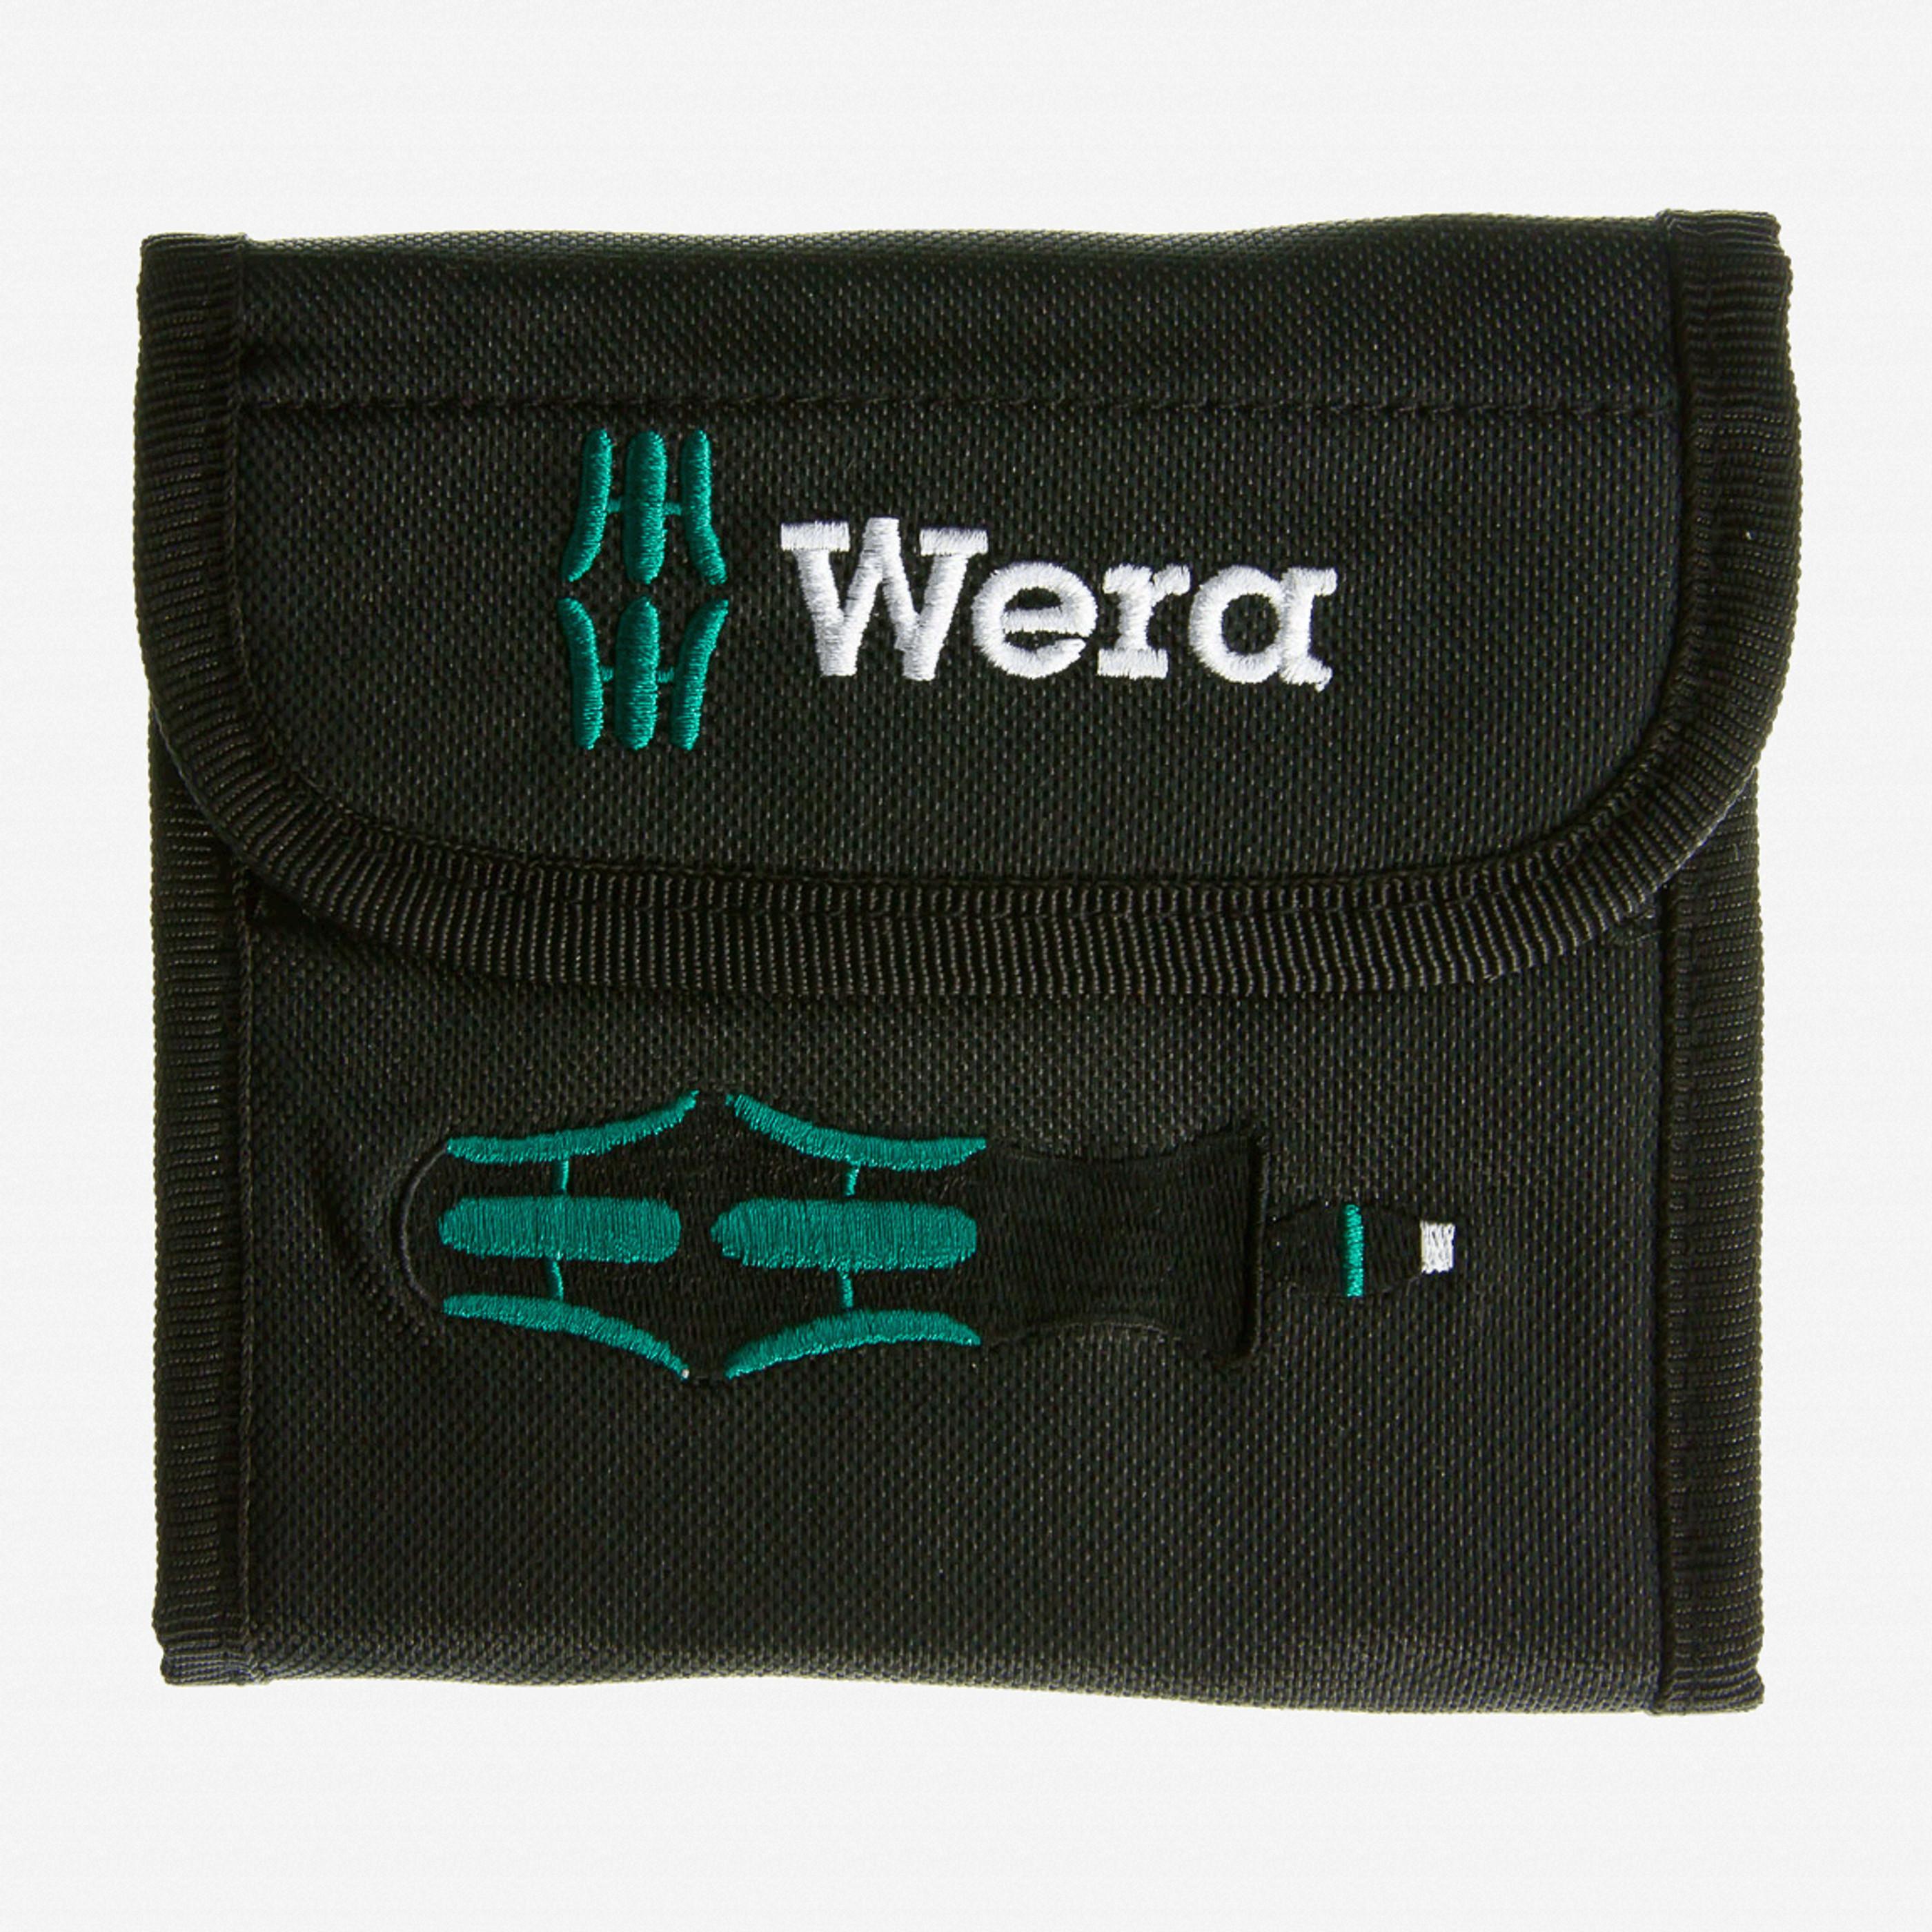 wera tools 671387 kraftform kompakt empty 17 piece bit and. Black Bedroom Furniture Sets. Home Design Ideas